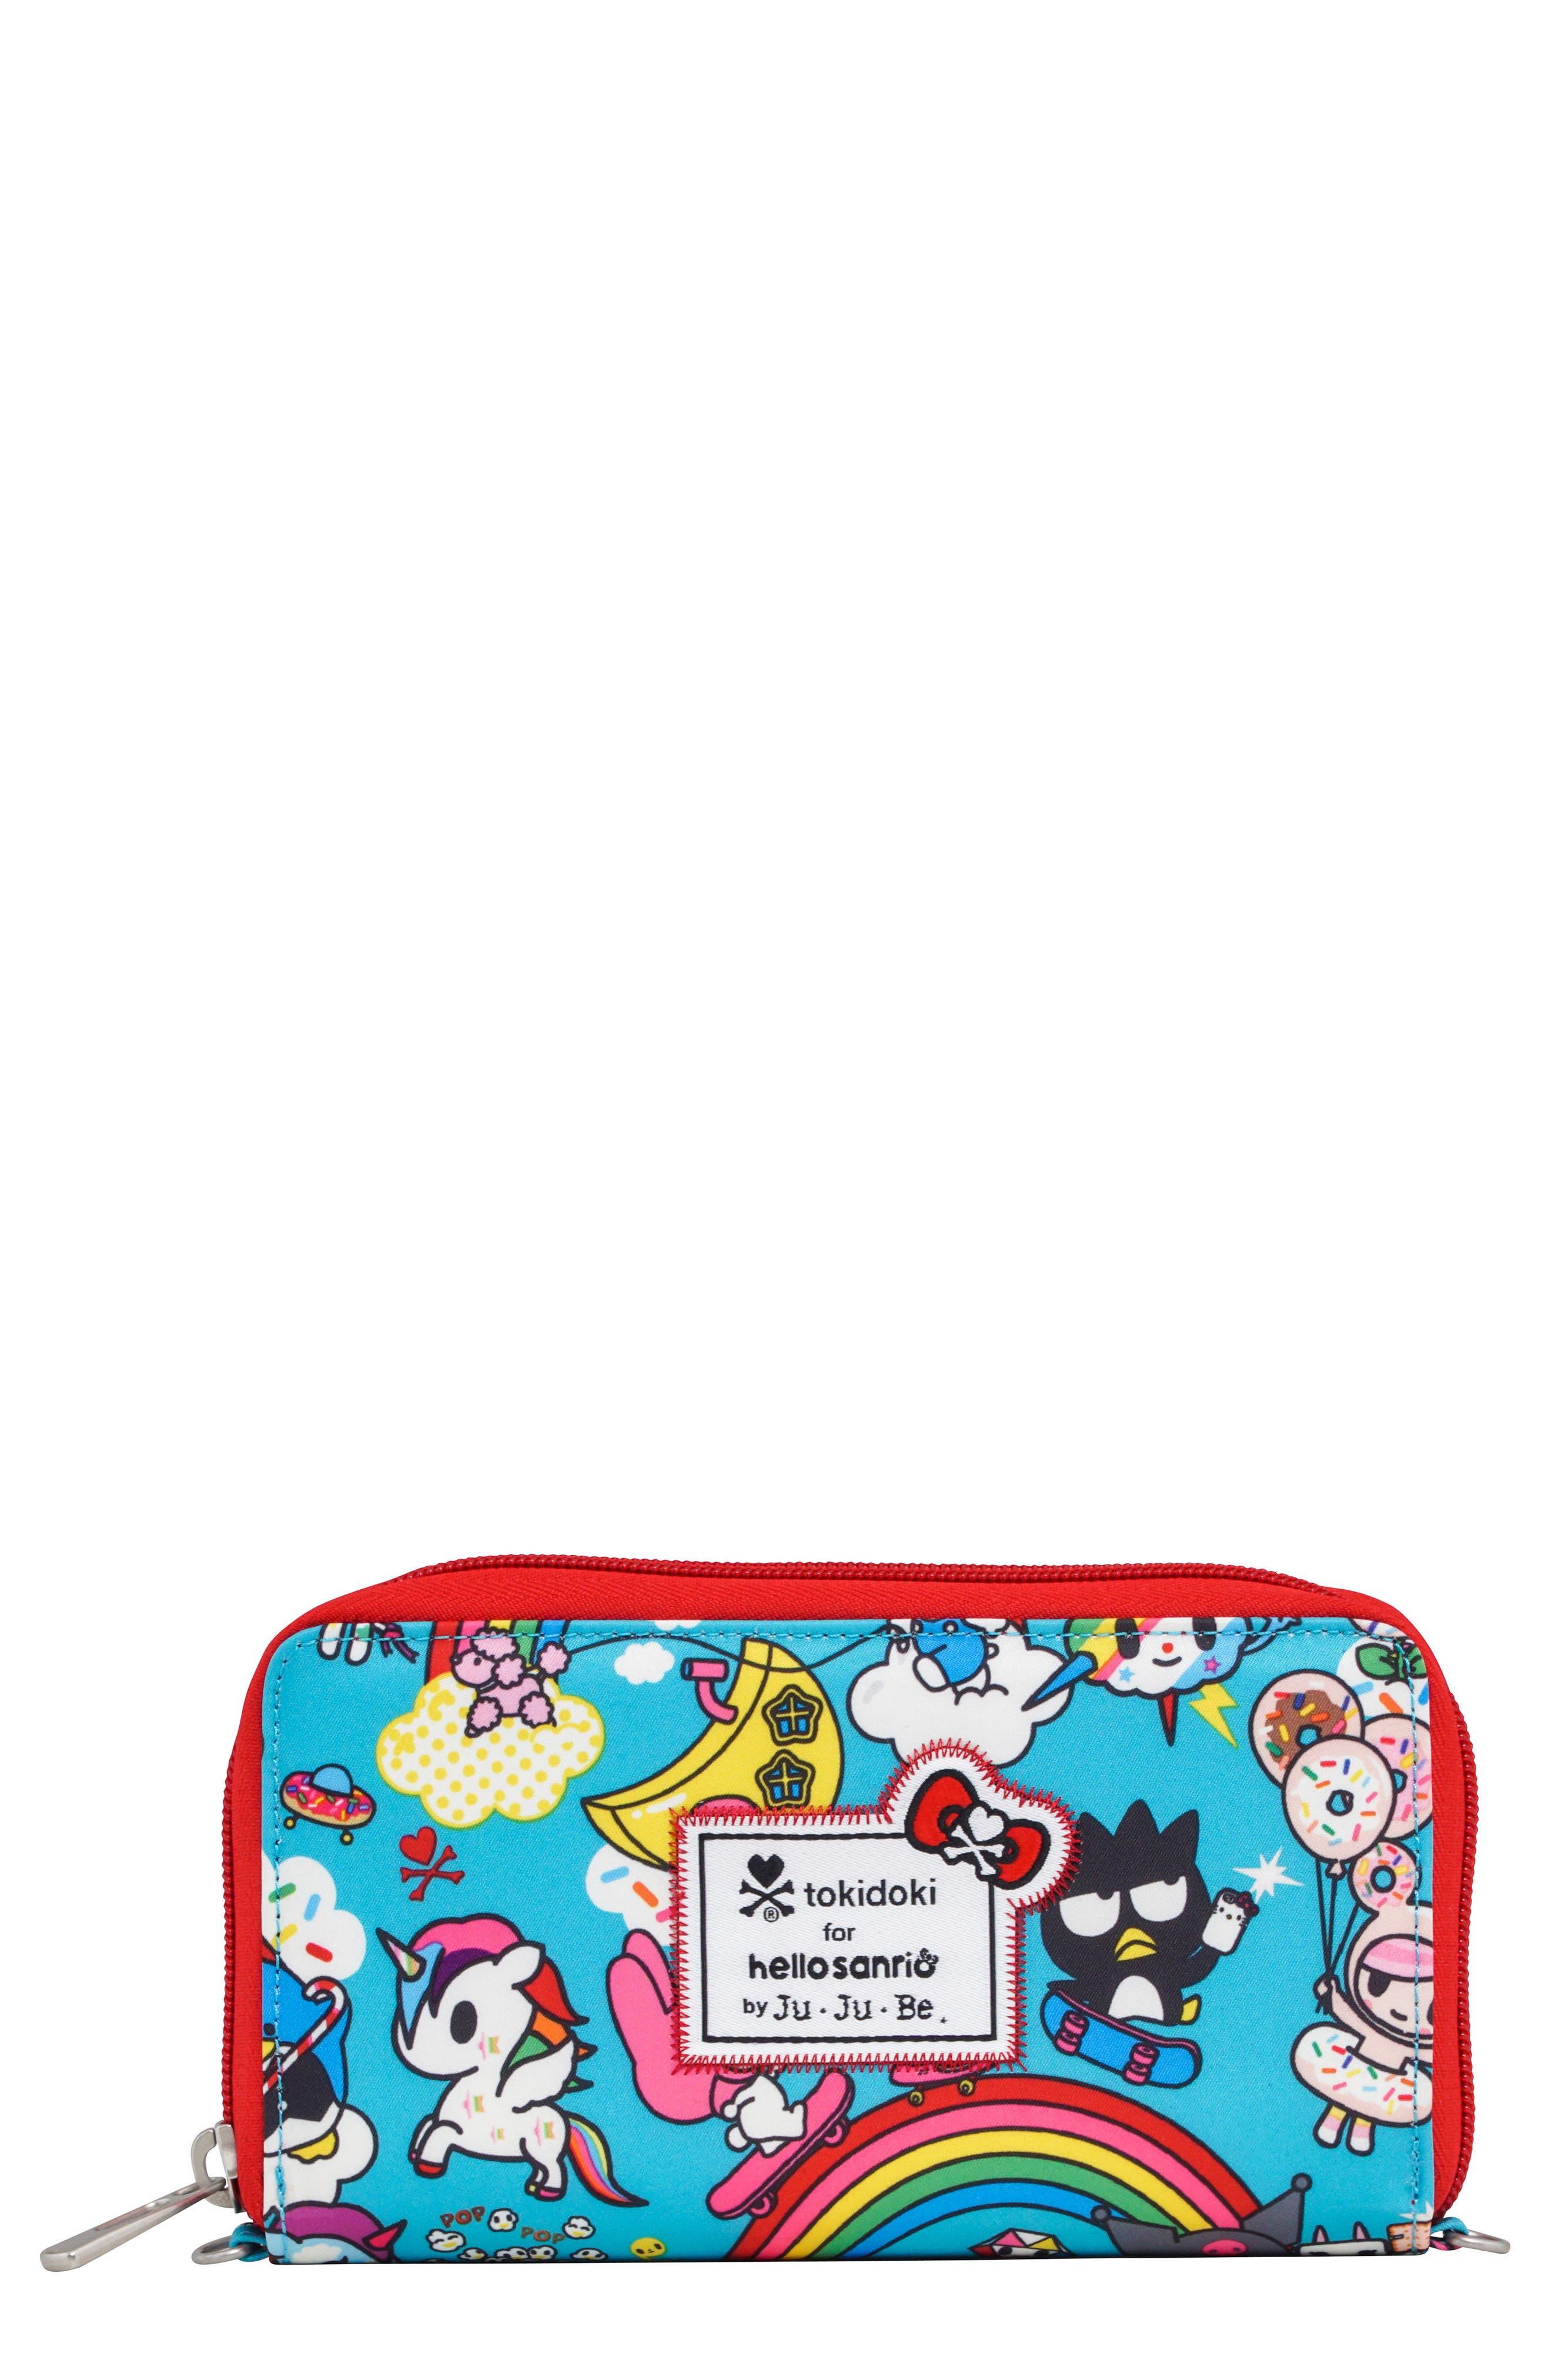 Ju-Ju-Be x tokidoki for Hello Sanrio Rainbow Dreams Be Spendy Clutch Wallet